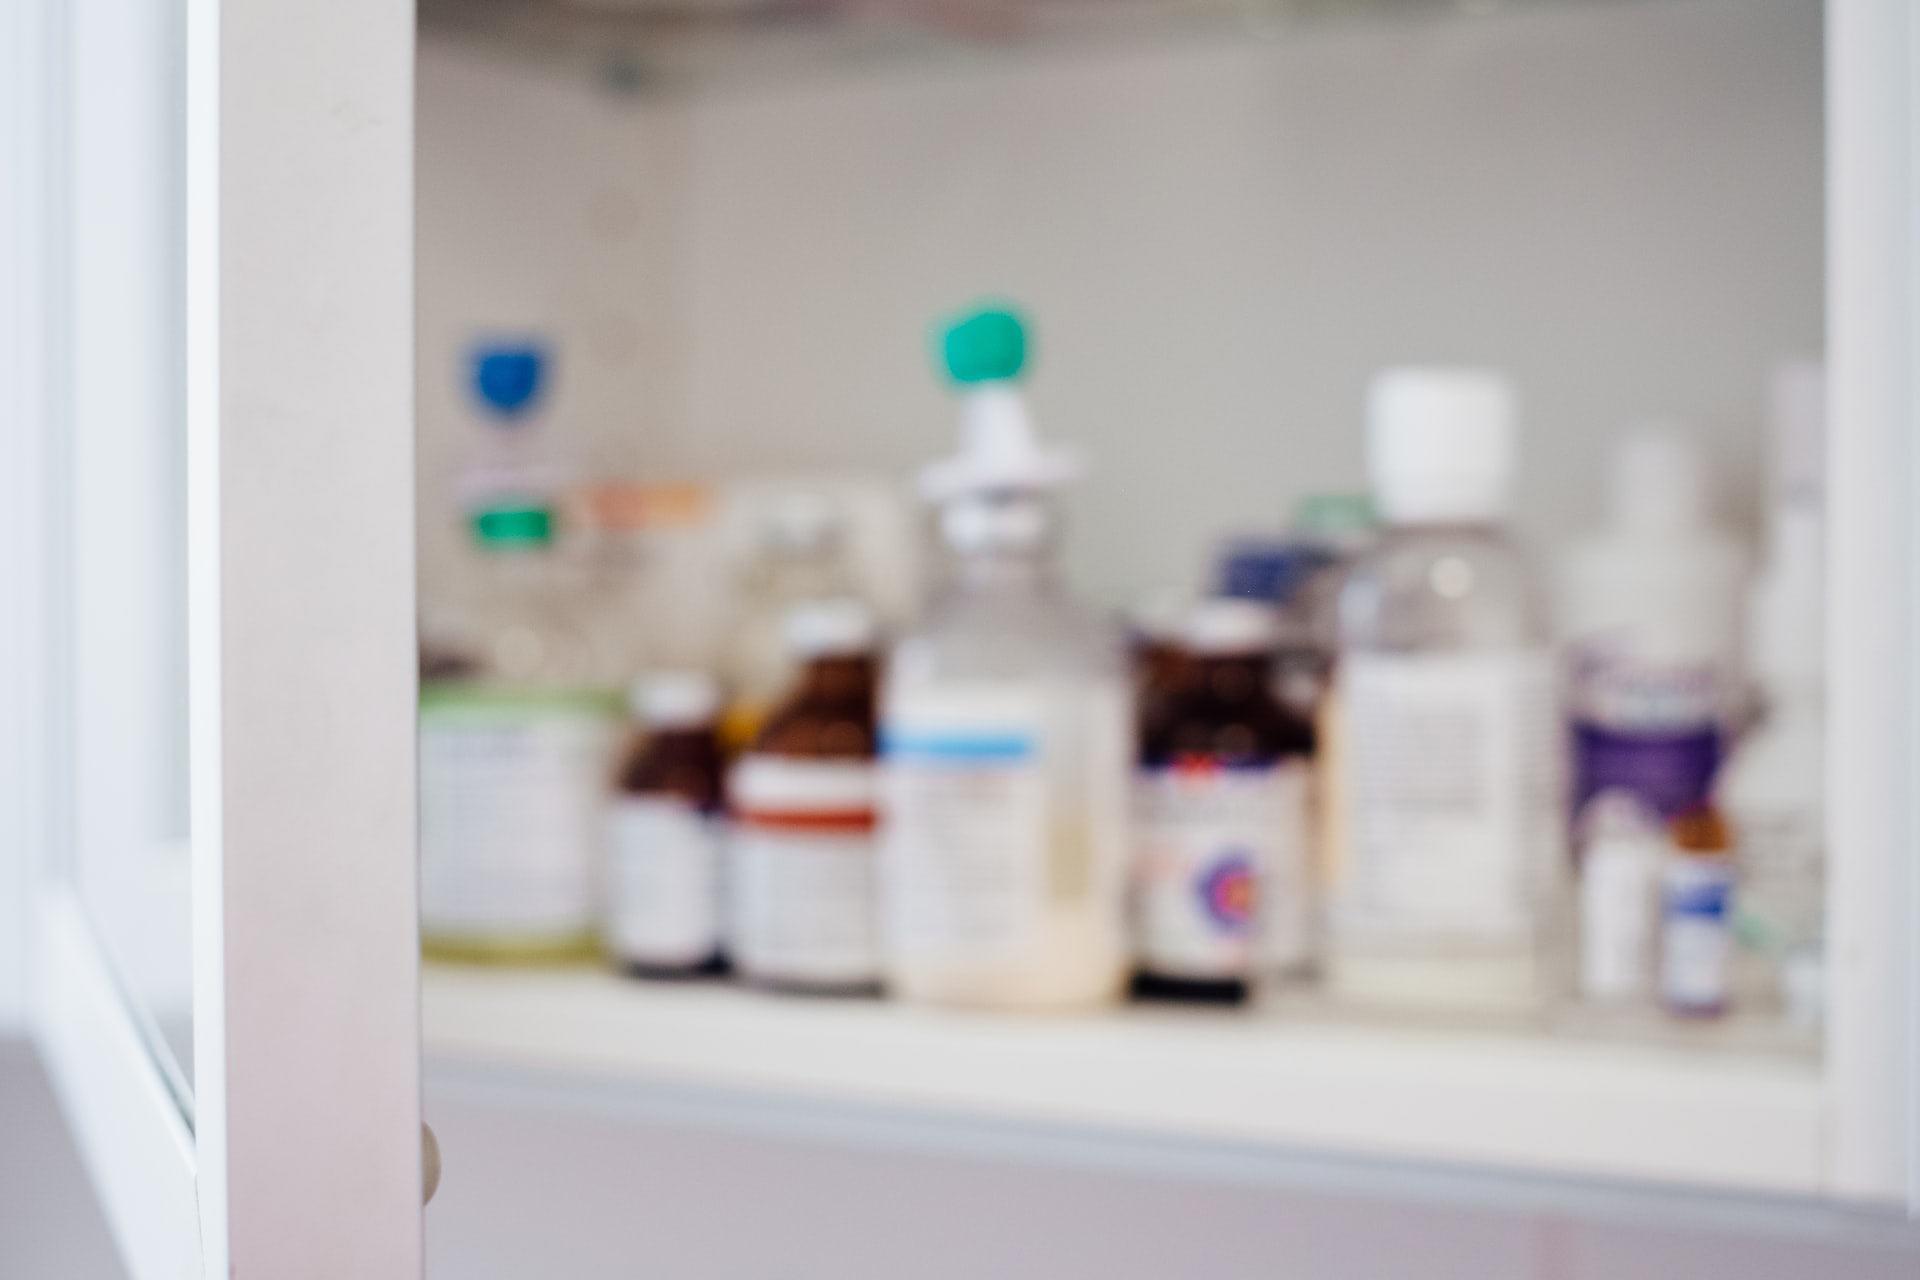 A blurry shot of someone's prescriptions in a medicine cabinet